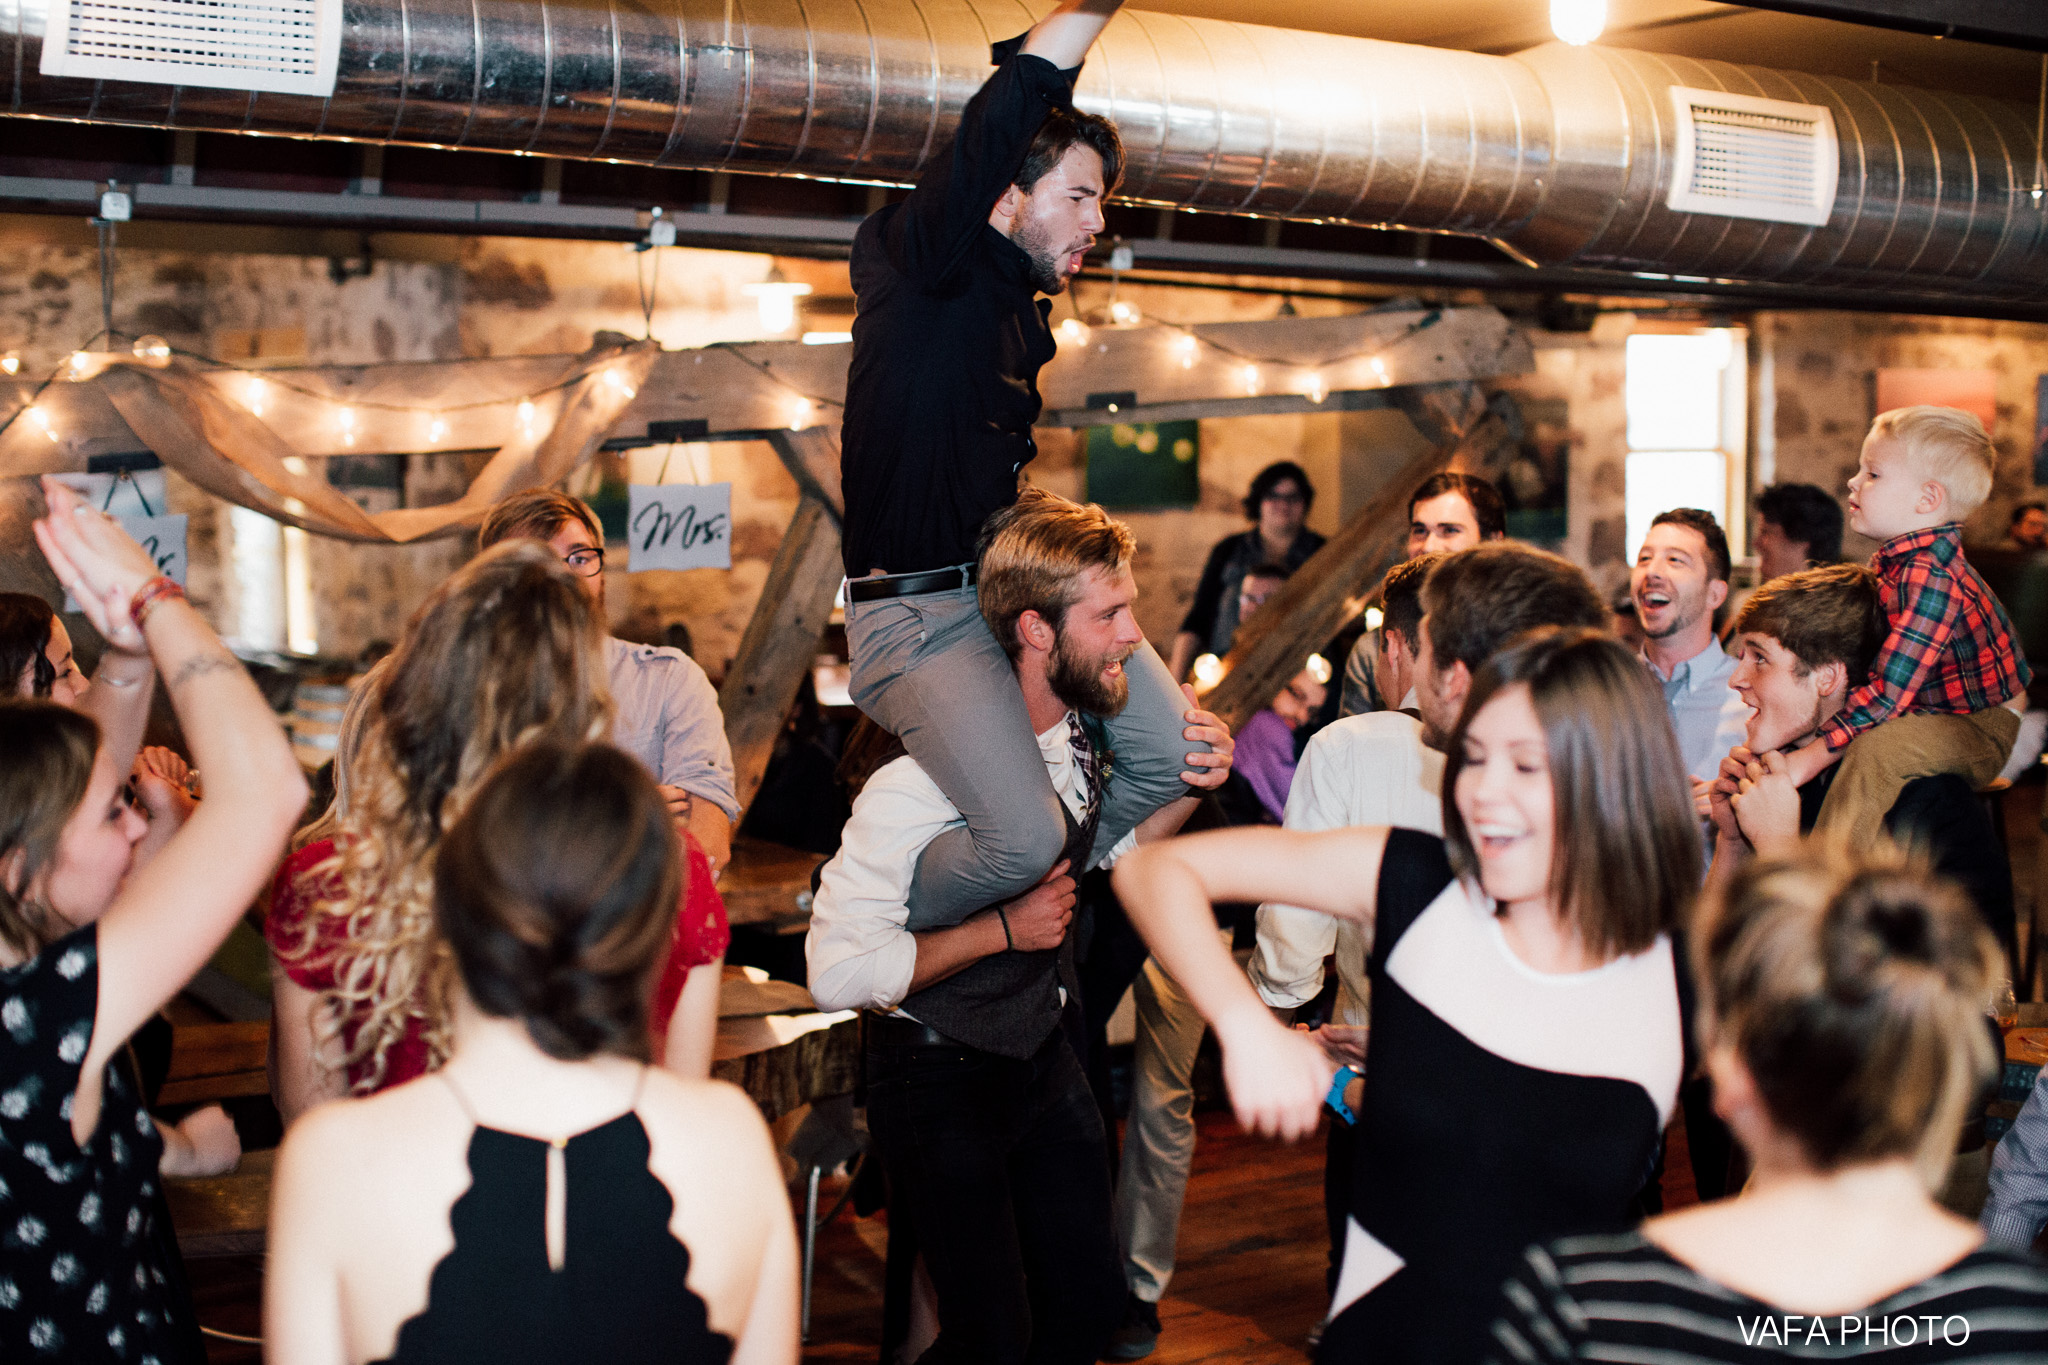 Hogback-Mountain-Wedding-Chelsea-Josh-Vafa-Photo-900.jpg